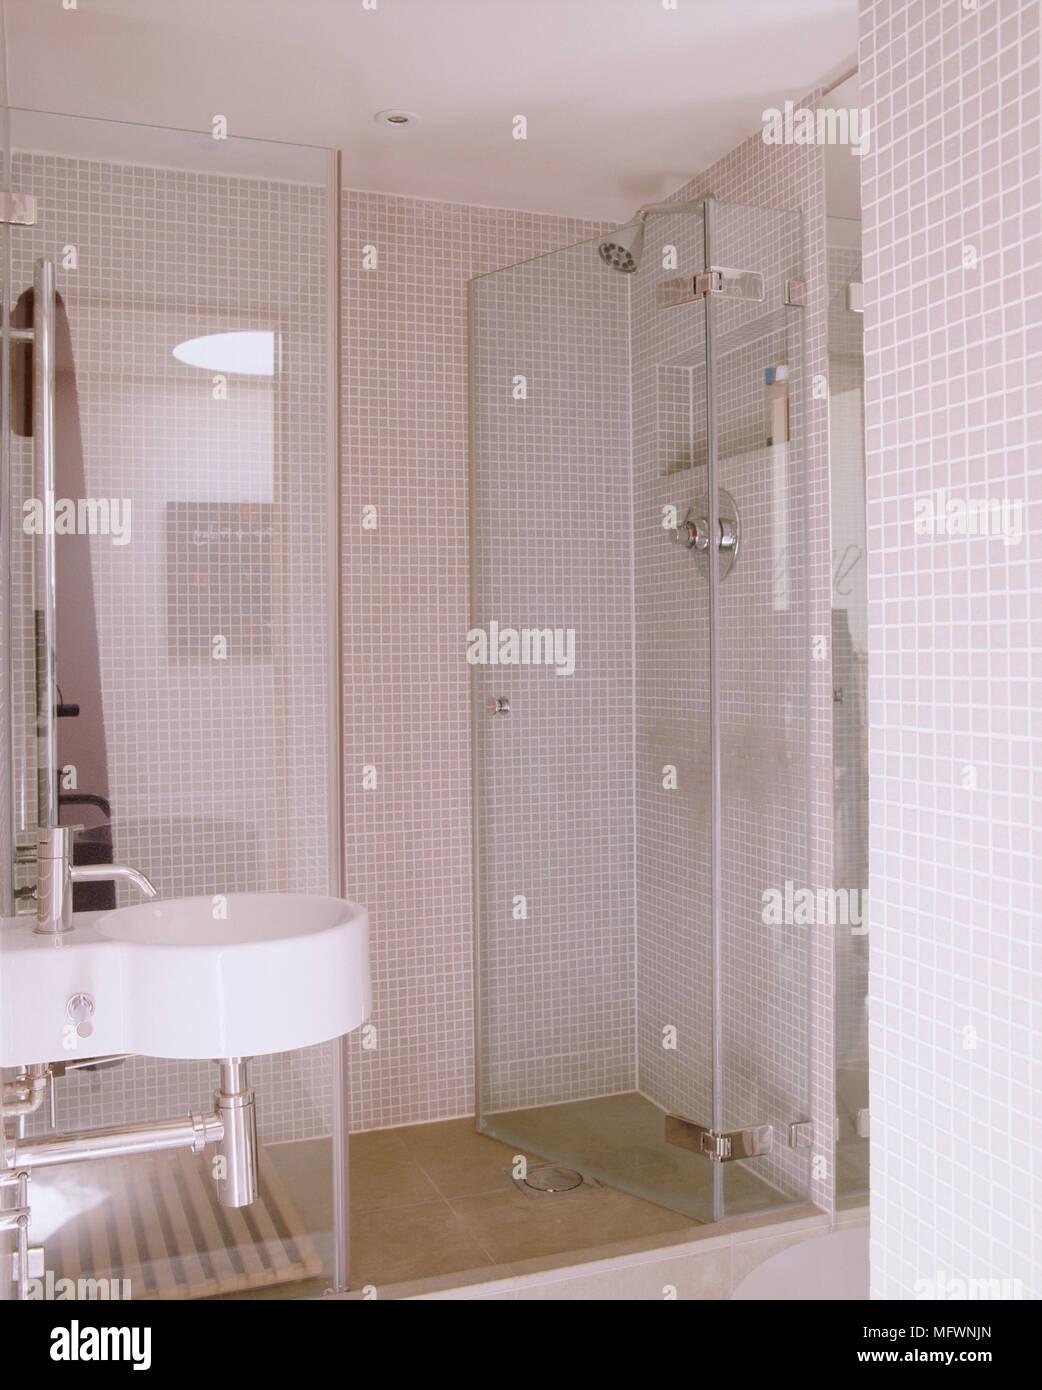 A detail of a modern, neutral bathroom with mosaic tiled walls, a ...